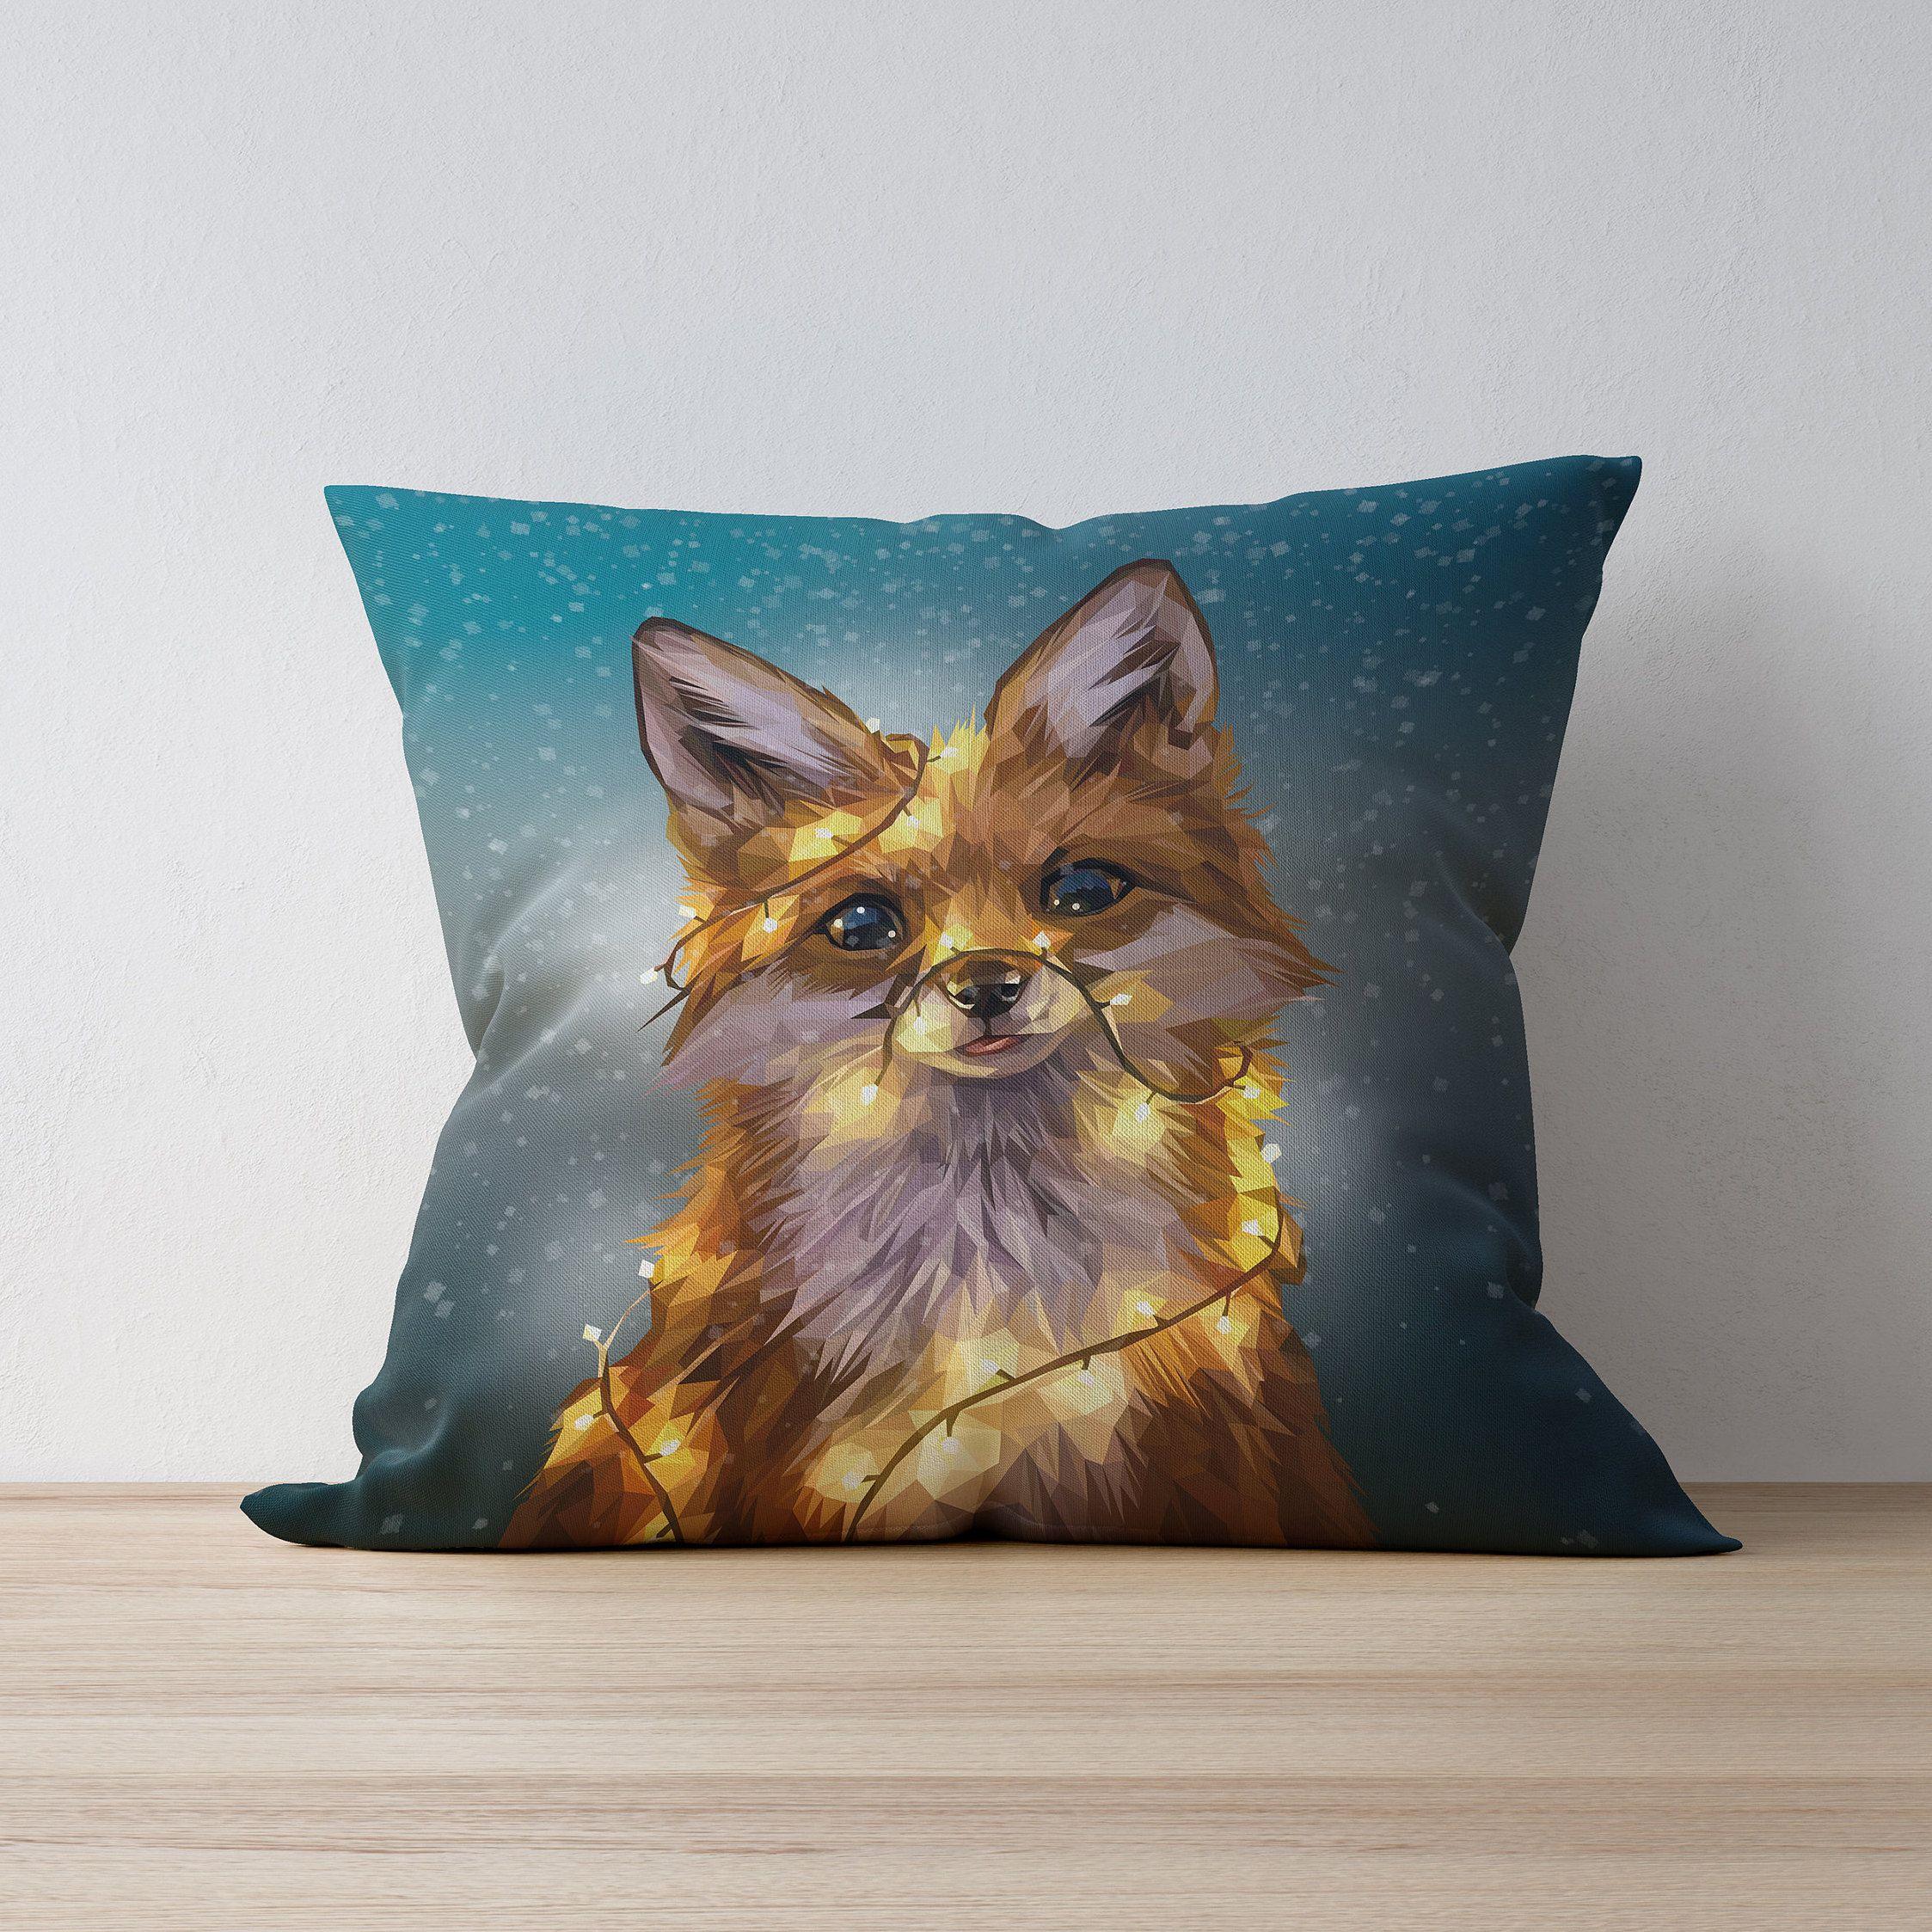 Weihnachts Fuchs Kissen Kissen Pillows In 2019 Fuchs Kissen